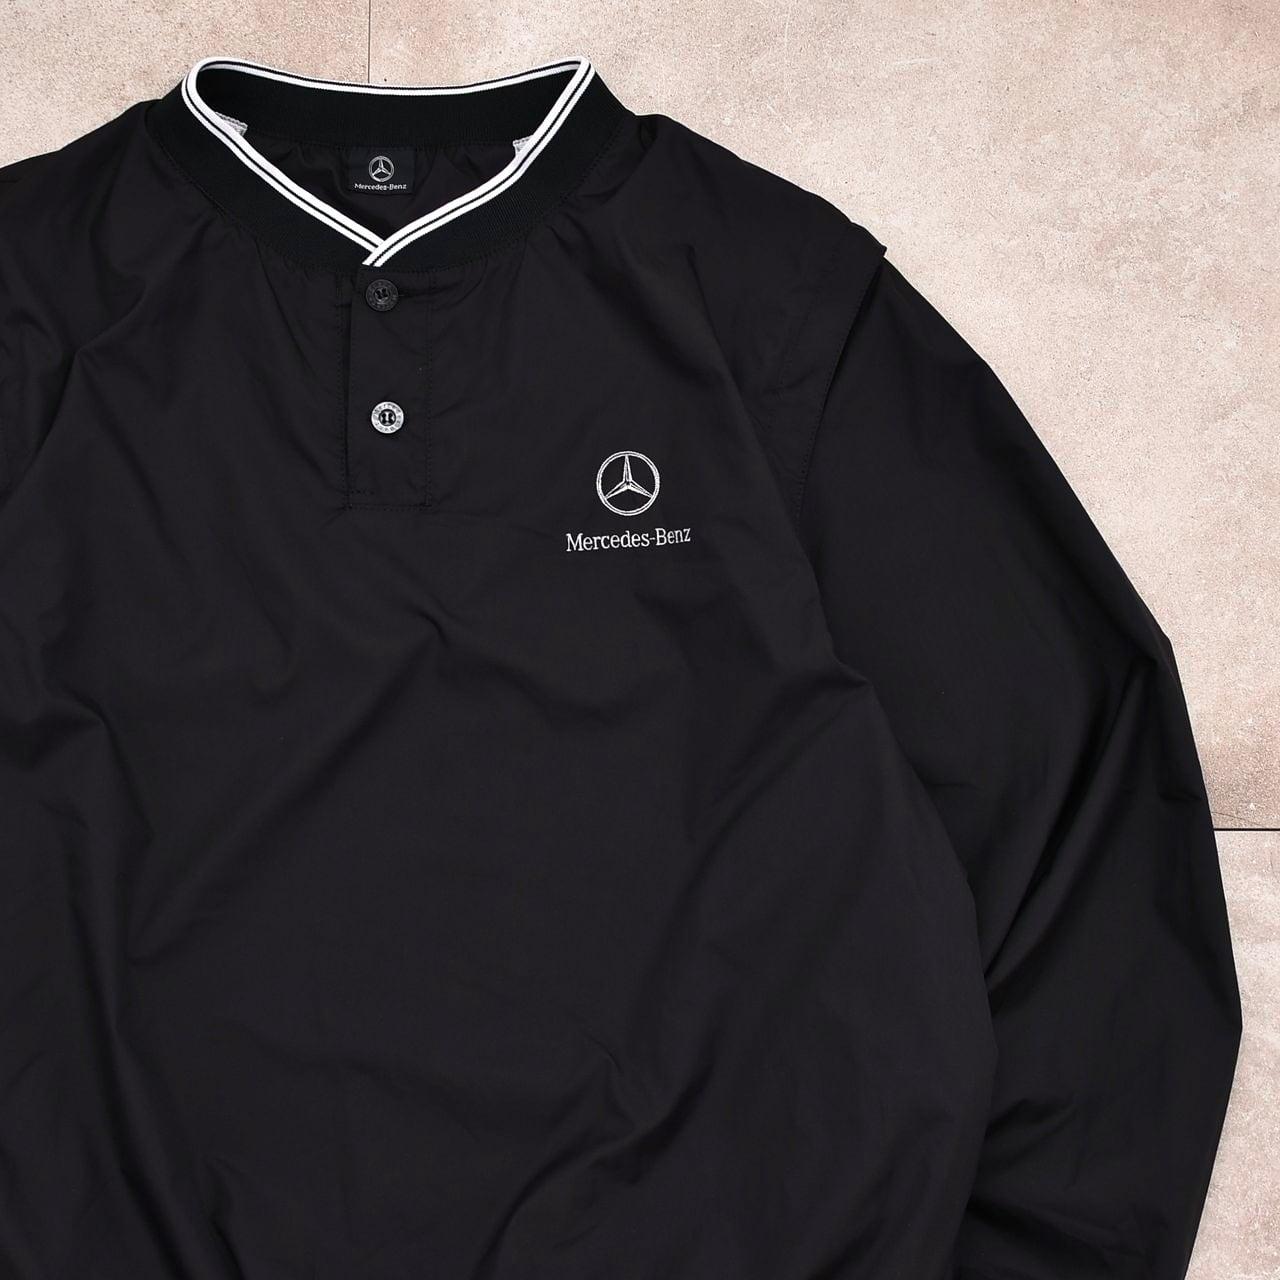 Mercedes-Benz logo embroidery po jacket